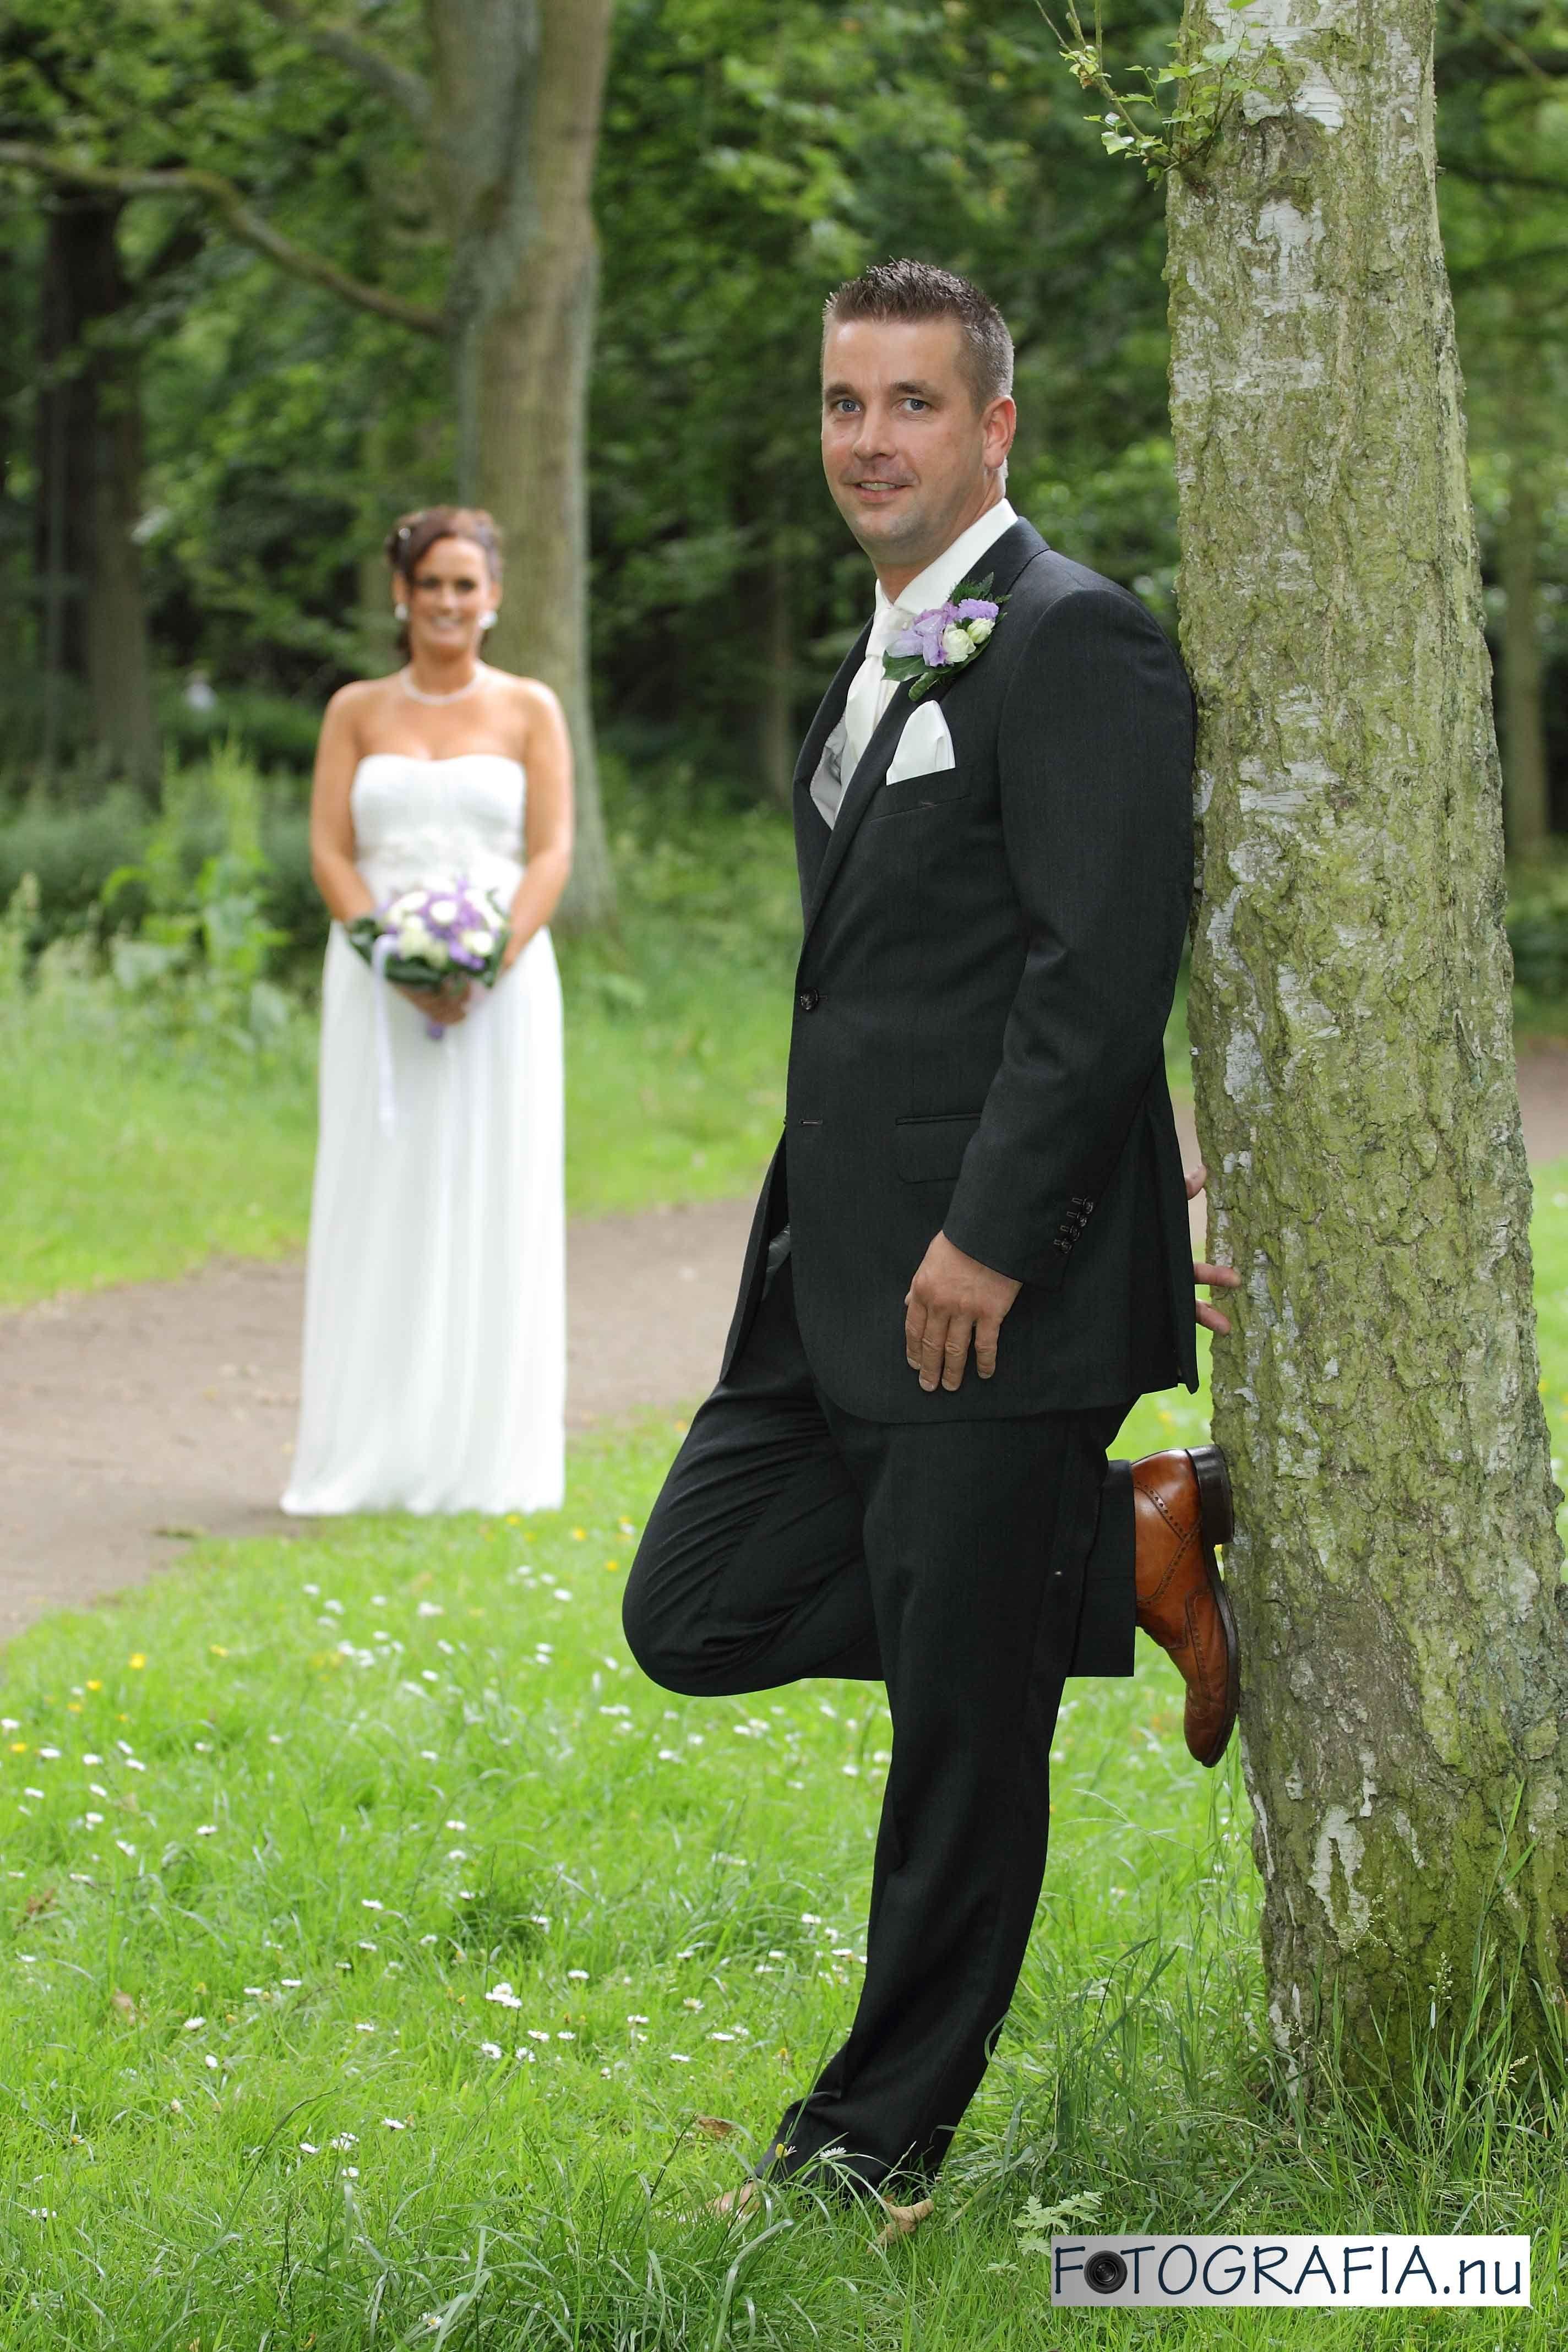 Trouwreportage Bruidsfotografie Bruidsfotograaf Huwelijk Bruiloft Wedding Fotoshoot Reportage ShootPhotoshoot IdeasWedding